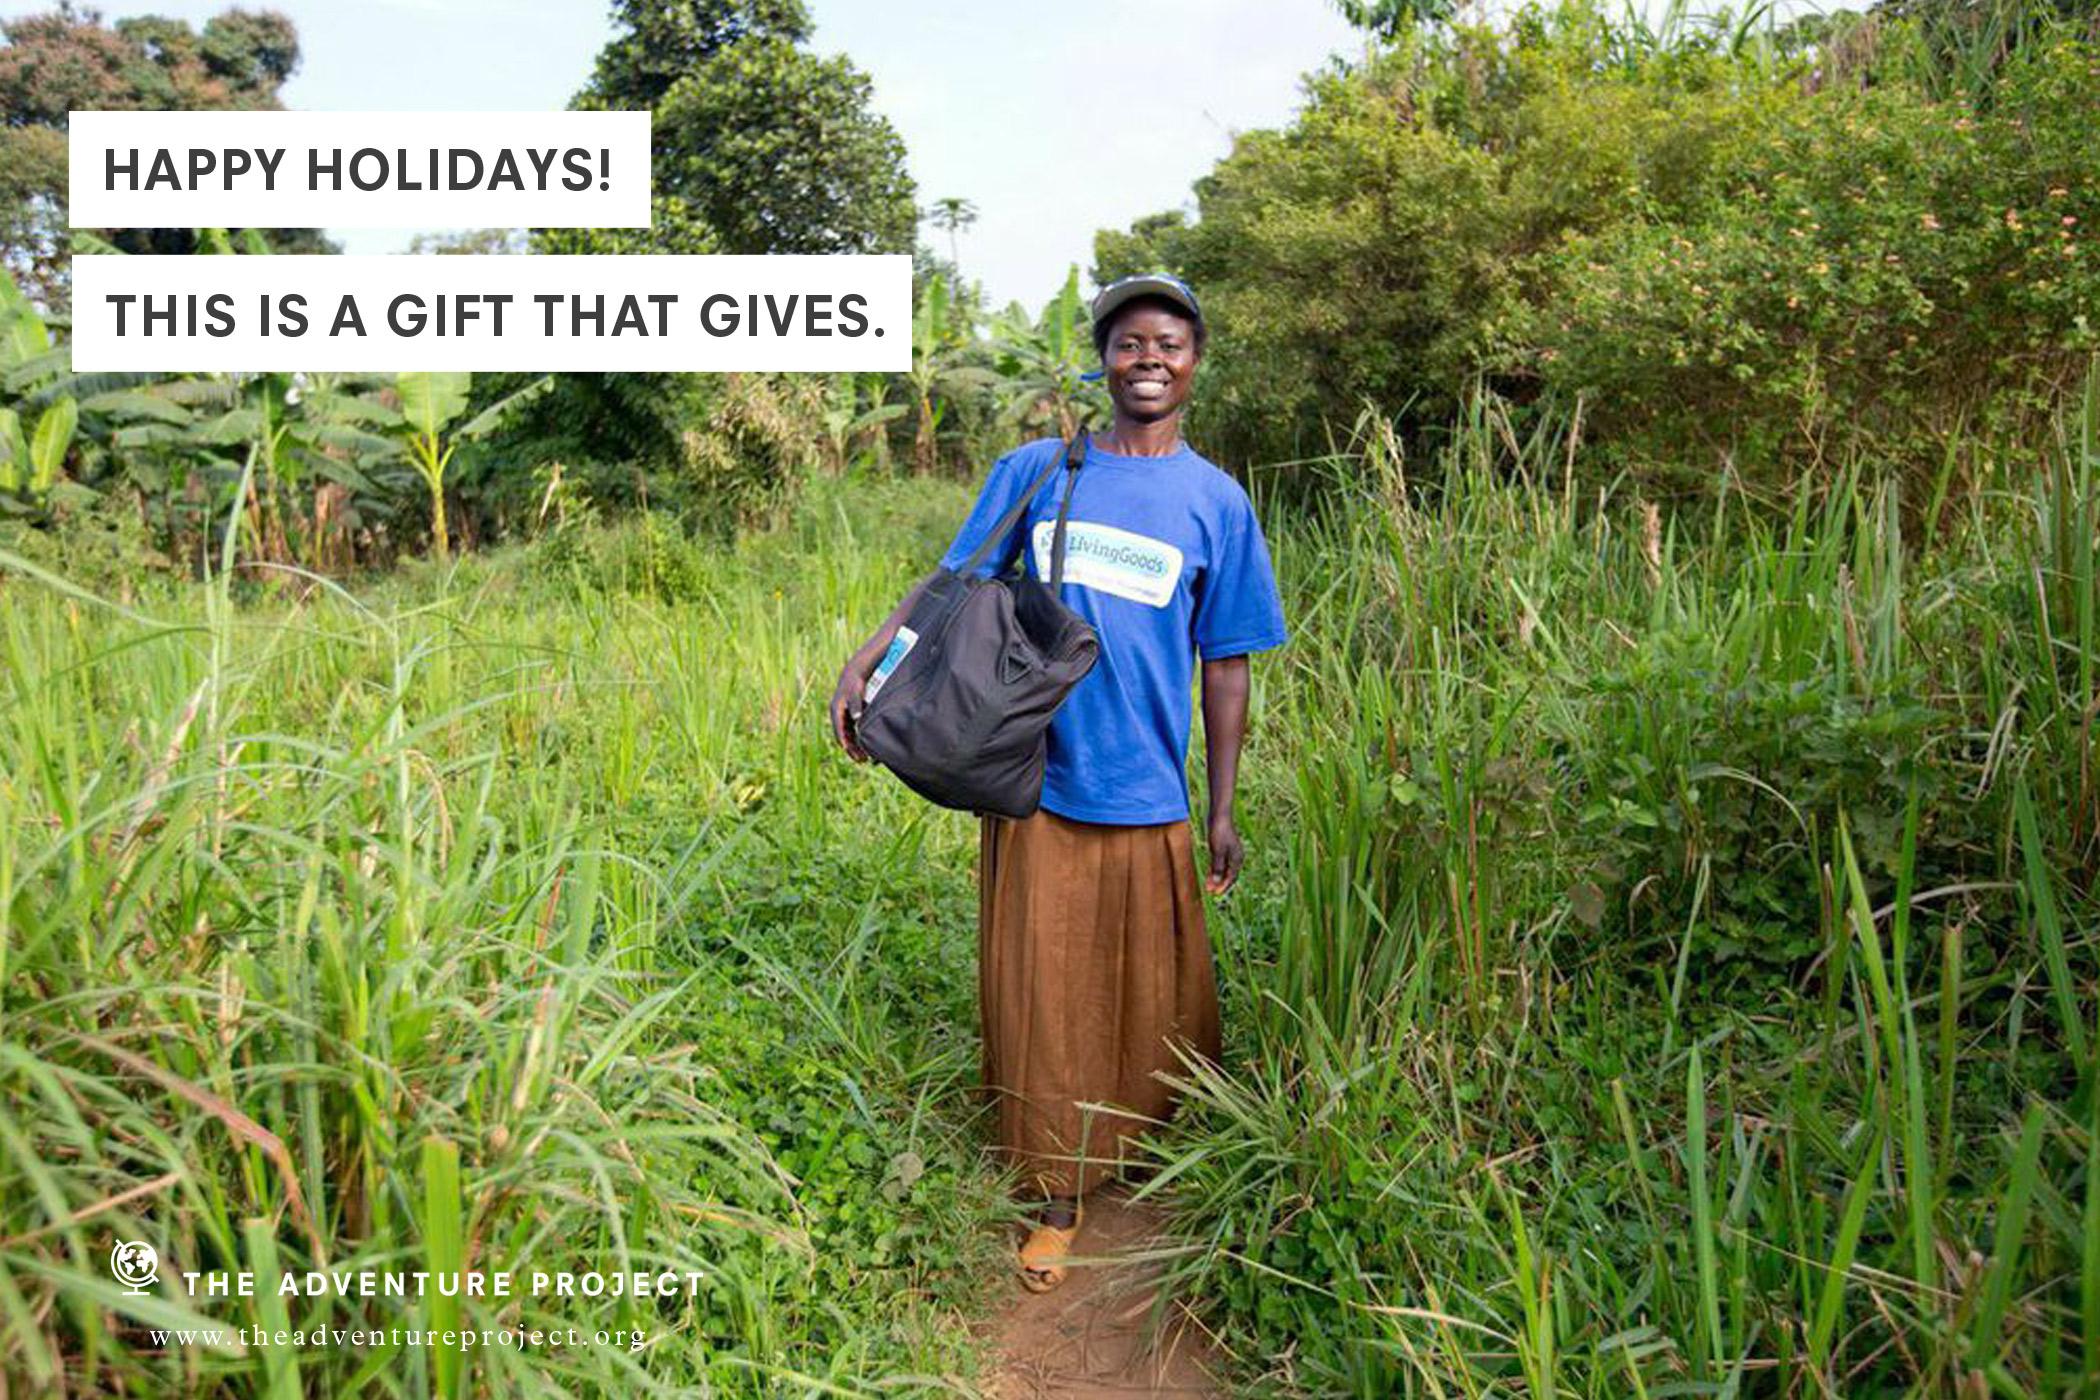 Holiday-e-card-Health-for-Uganda.jpg